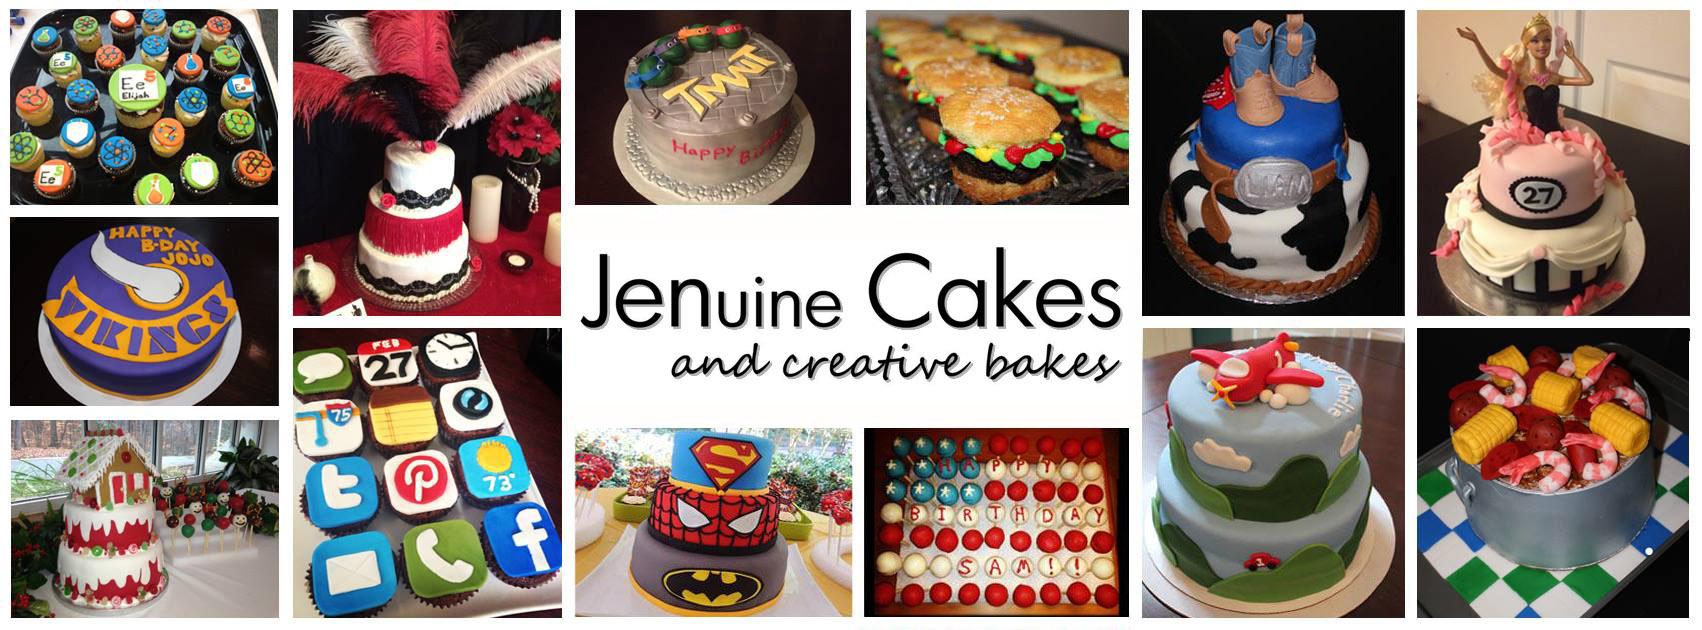 Jenuine Cakes